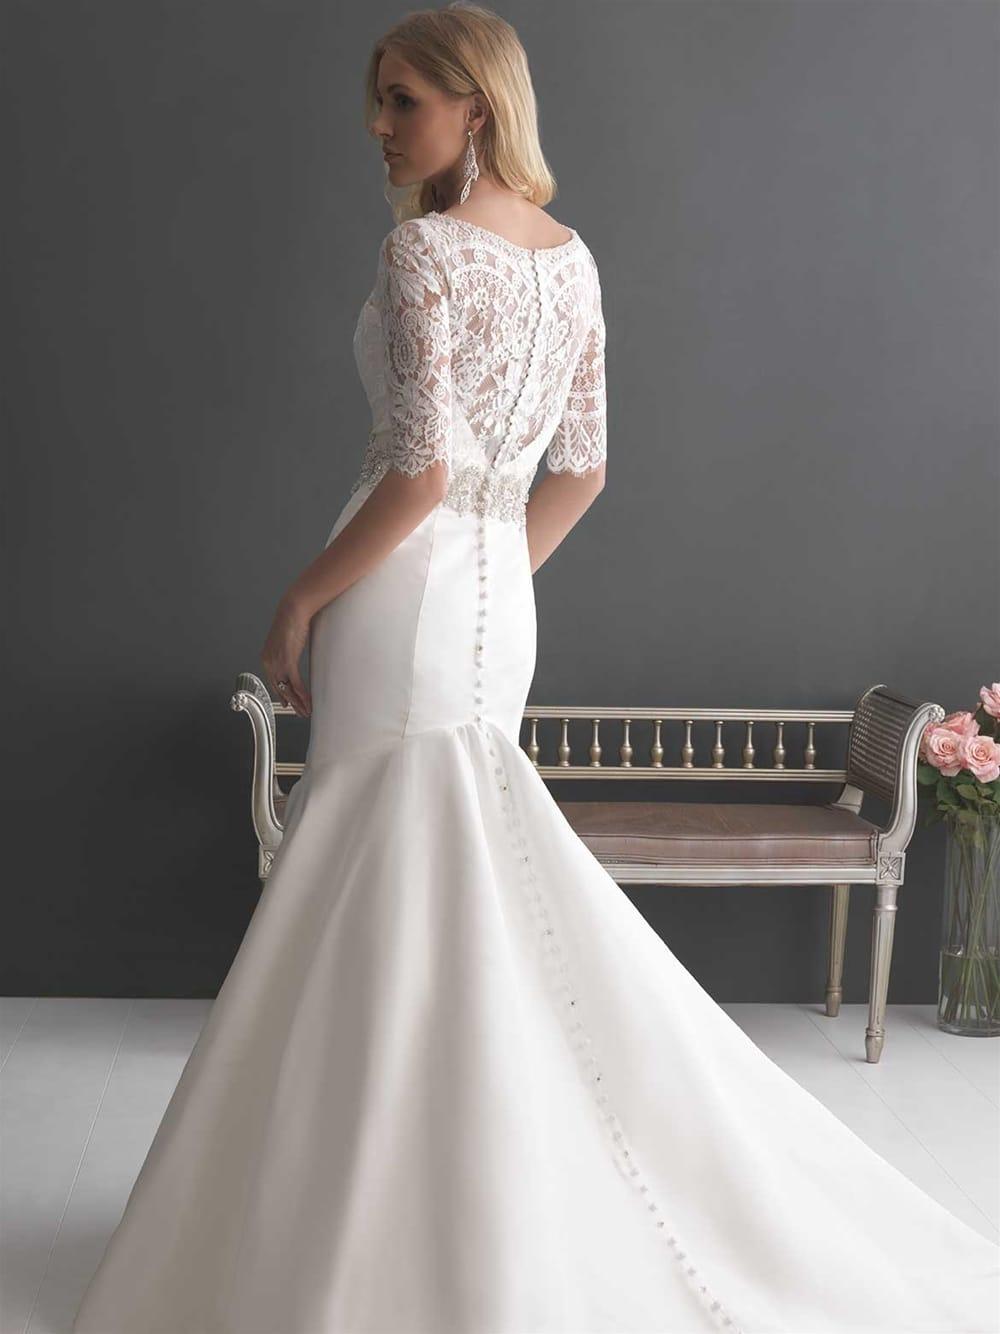 Buy allure bridesmaid dresses online